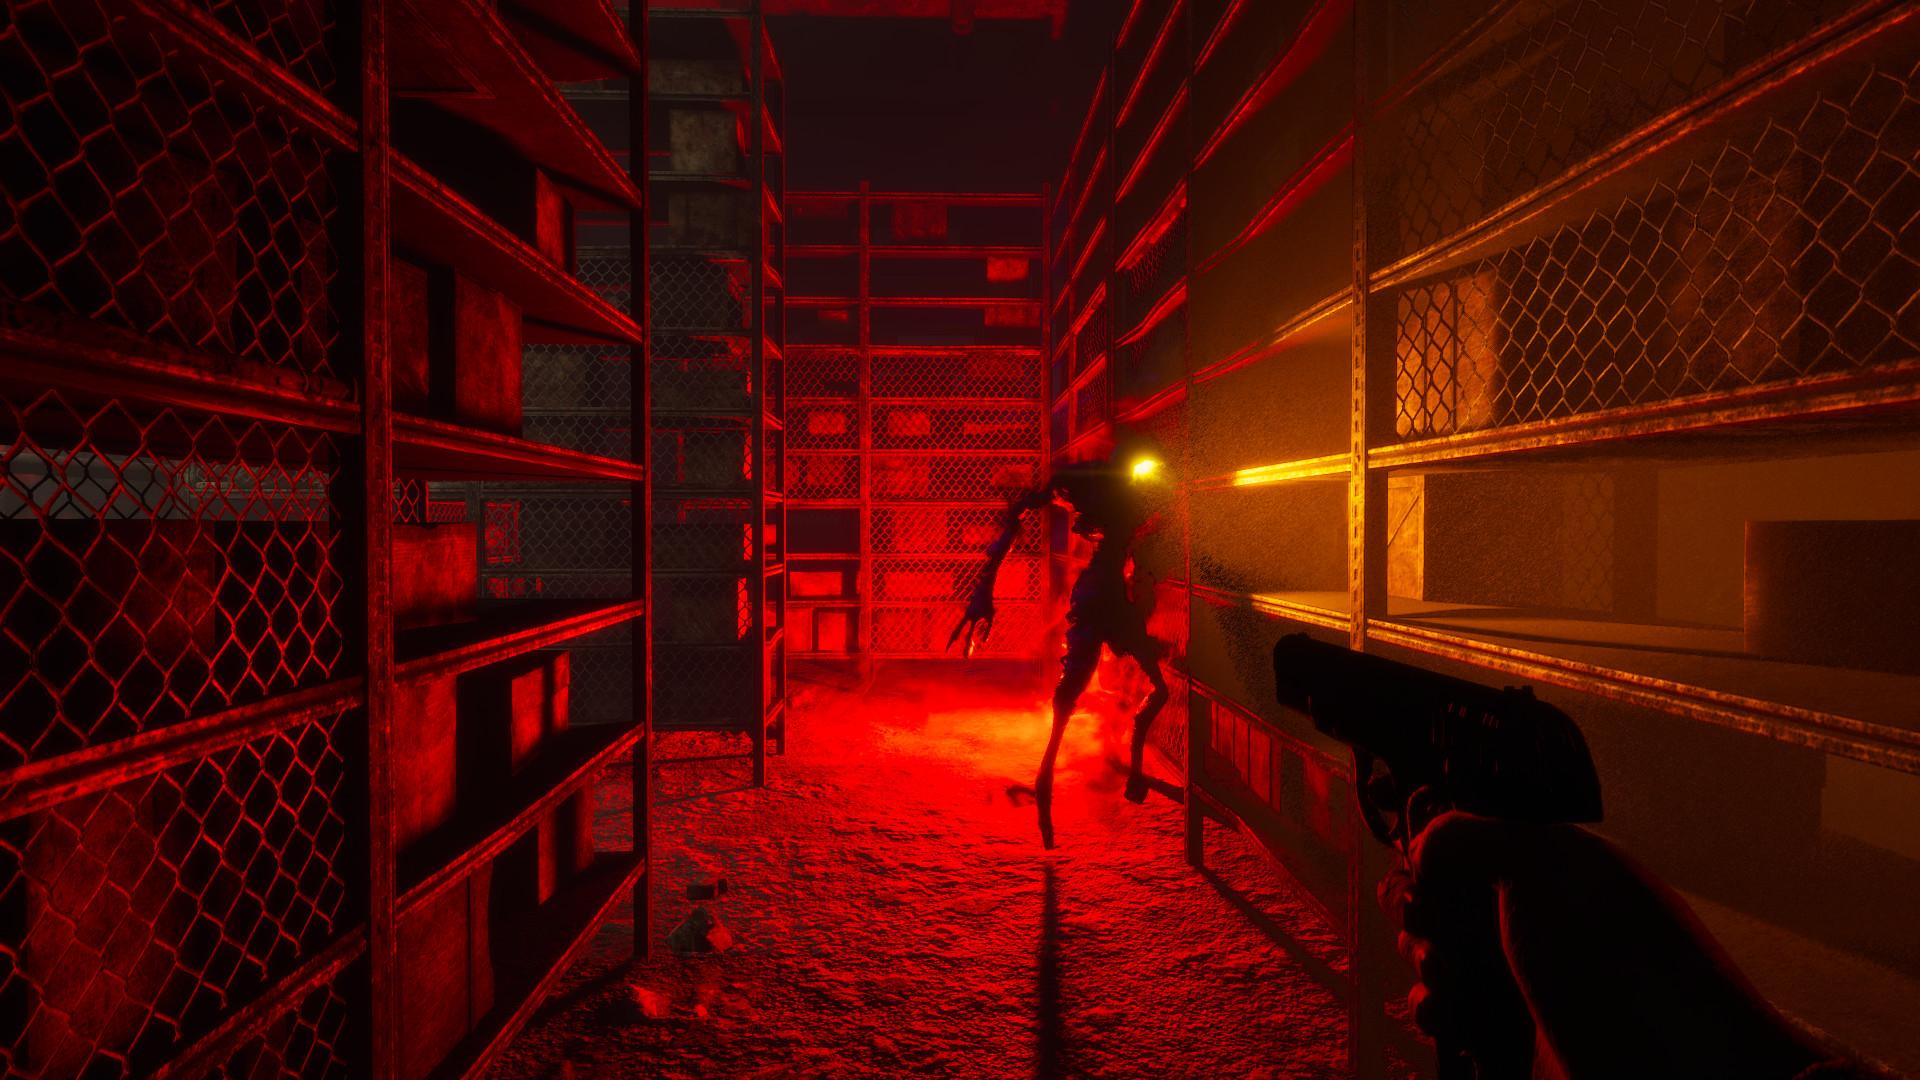 https://new-game-plus.fr/wp-content/uploads/2020/08/In-sound-mind-gameplay.jpg